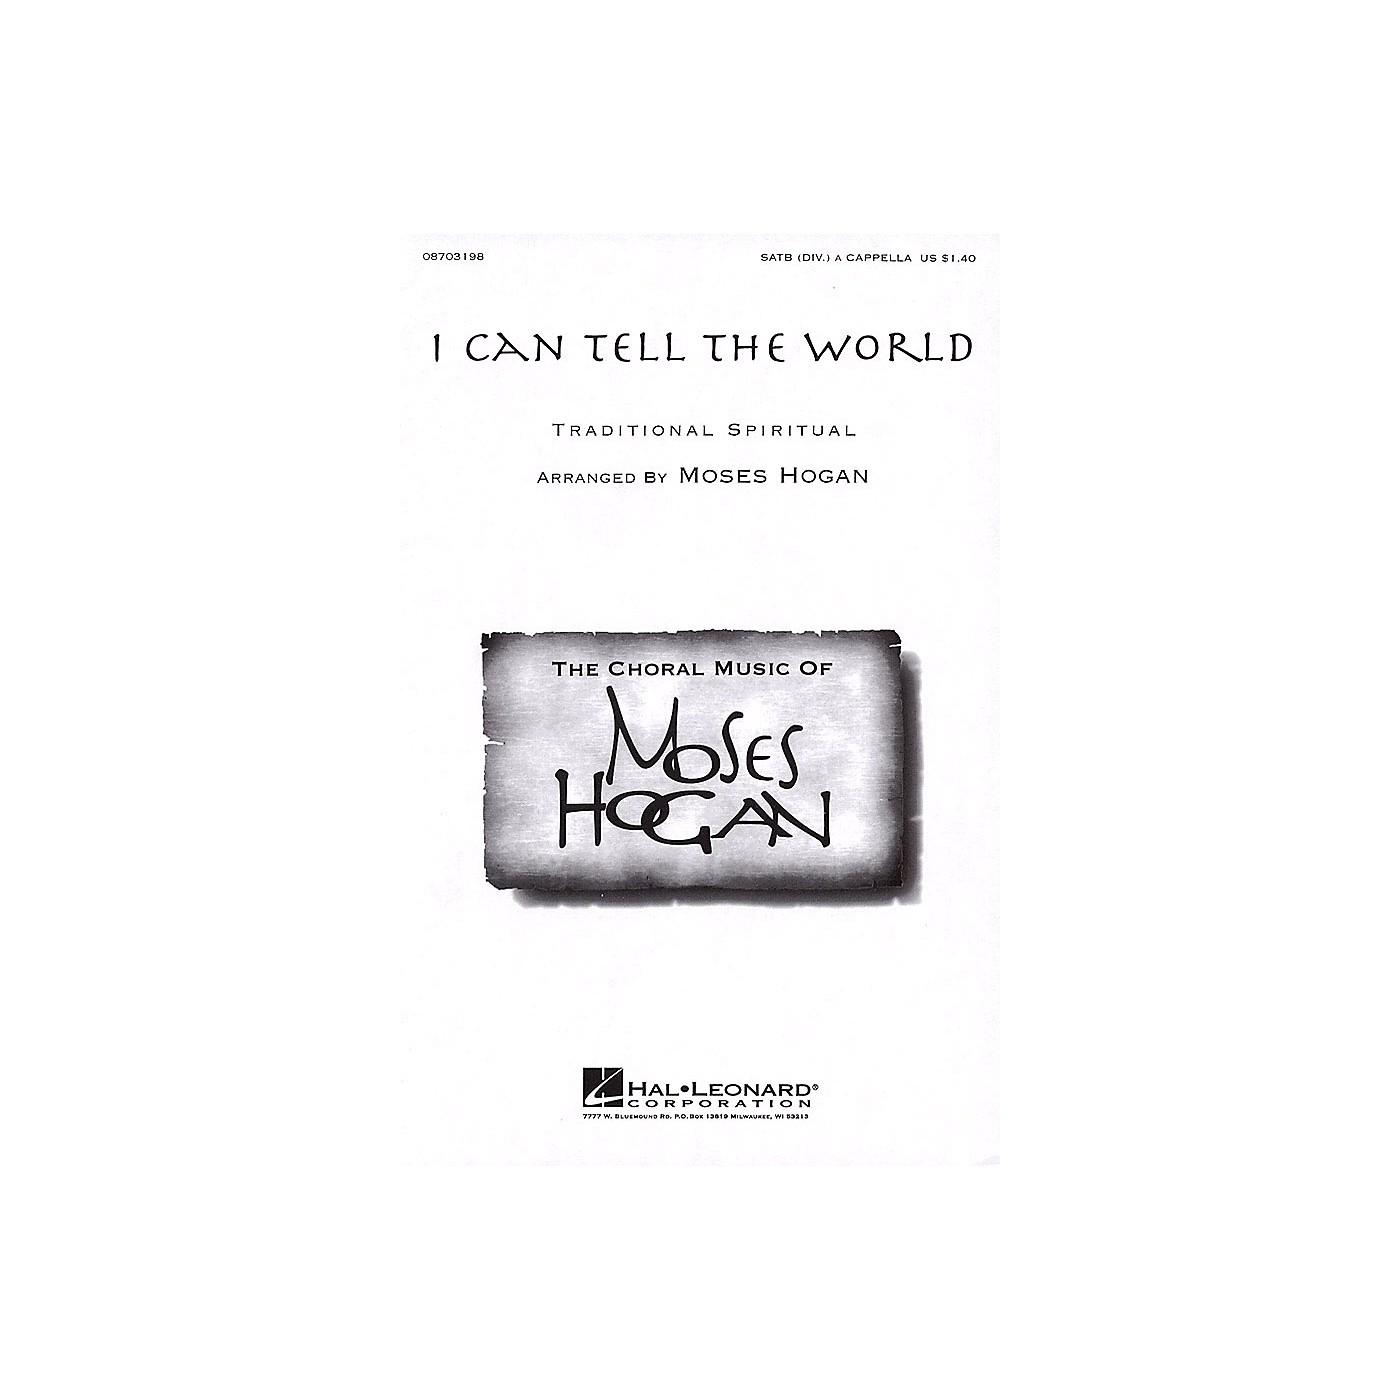 Hal Leonard I Can Tell the World SATB DV A Cappella arranged by Moses Hogan thumbnail